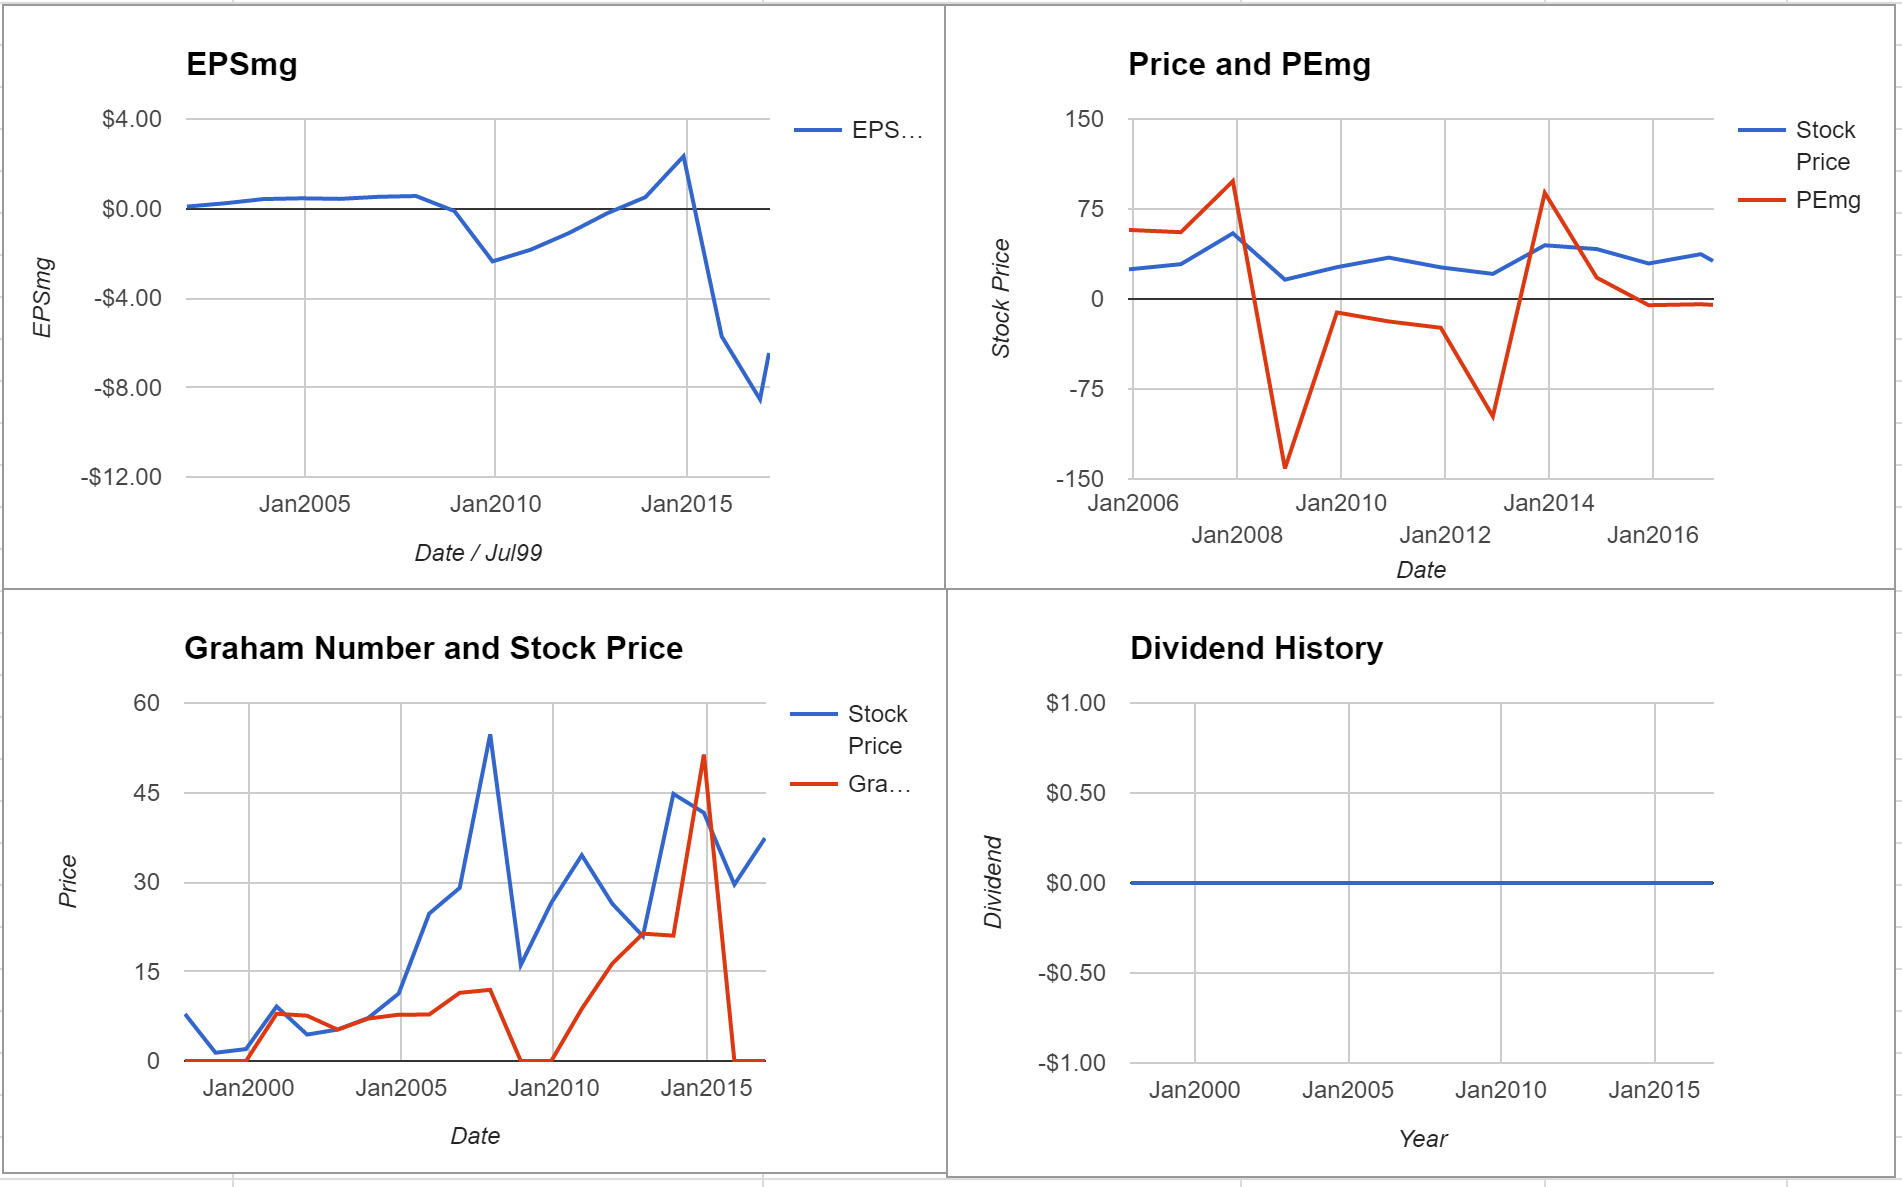 Carrizo Oil & Gas Inc Valuation – Initial Coverage $CRZO